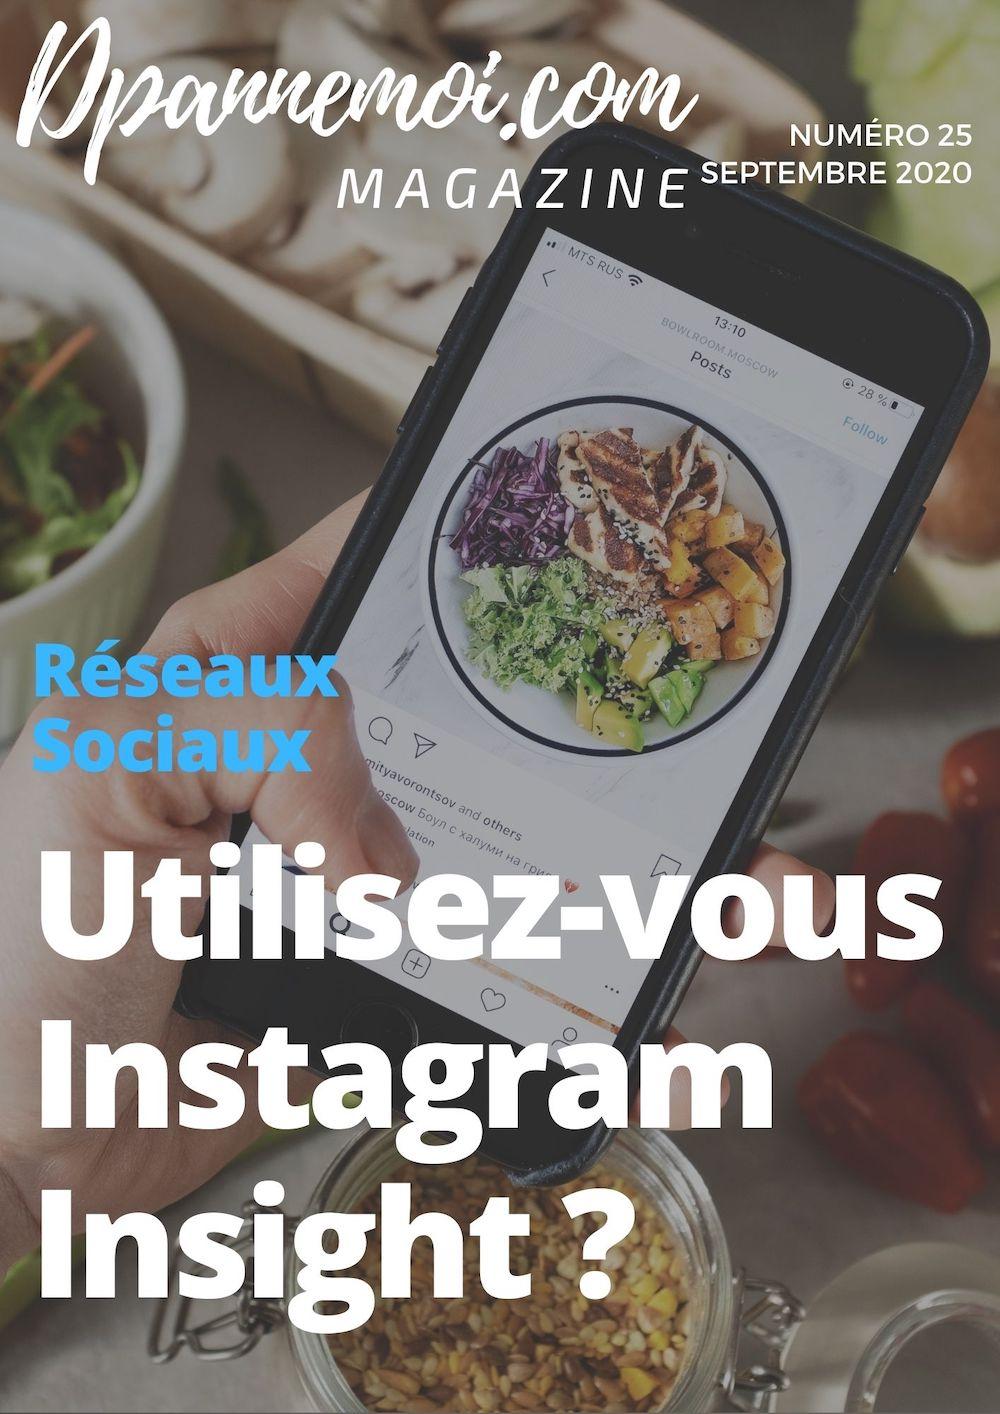 le guide ultime pour enfin comprendre Instagram Insight